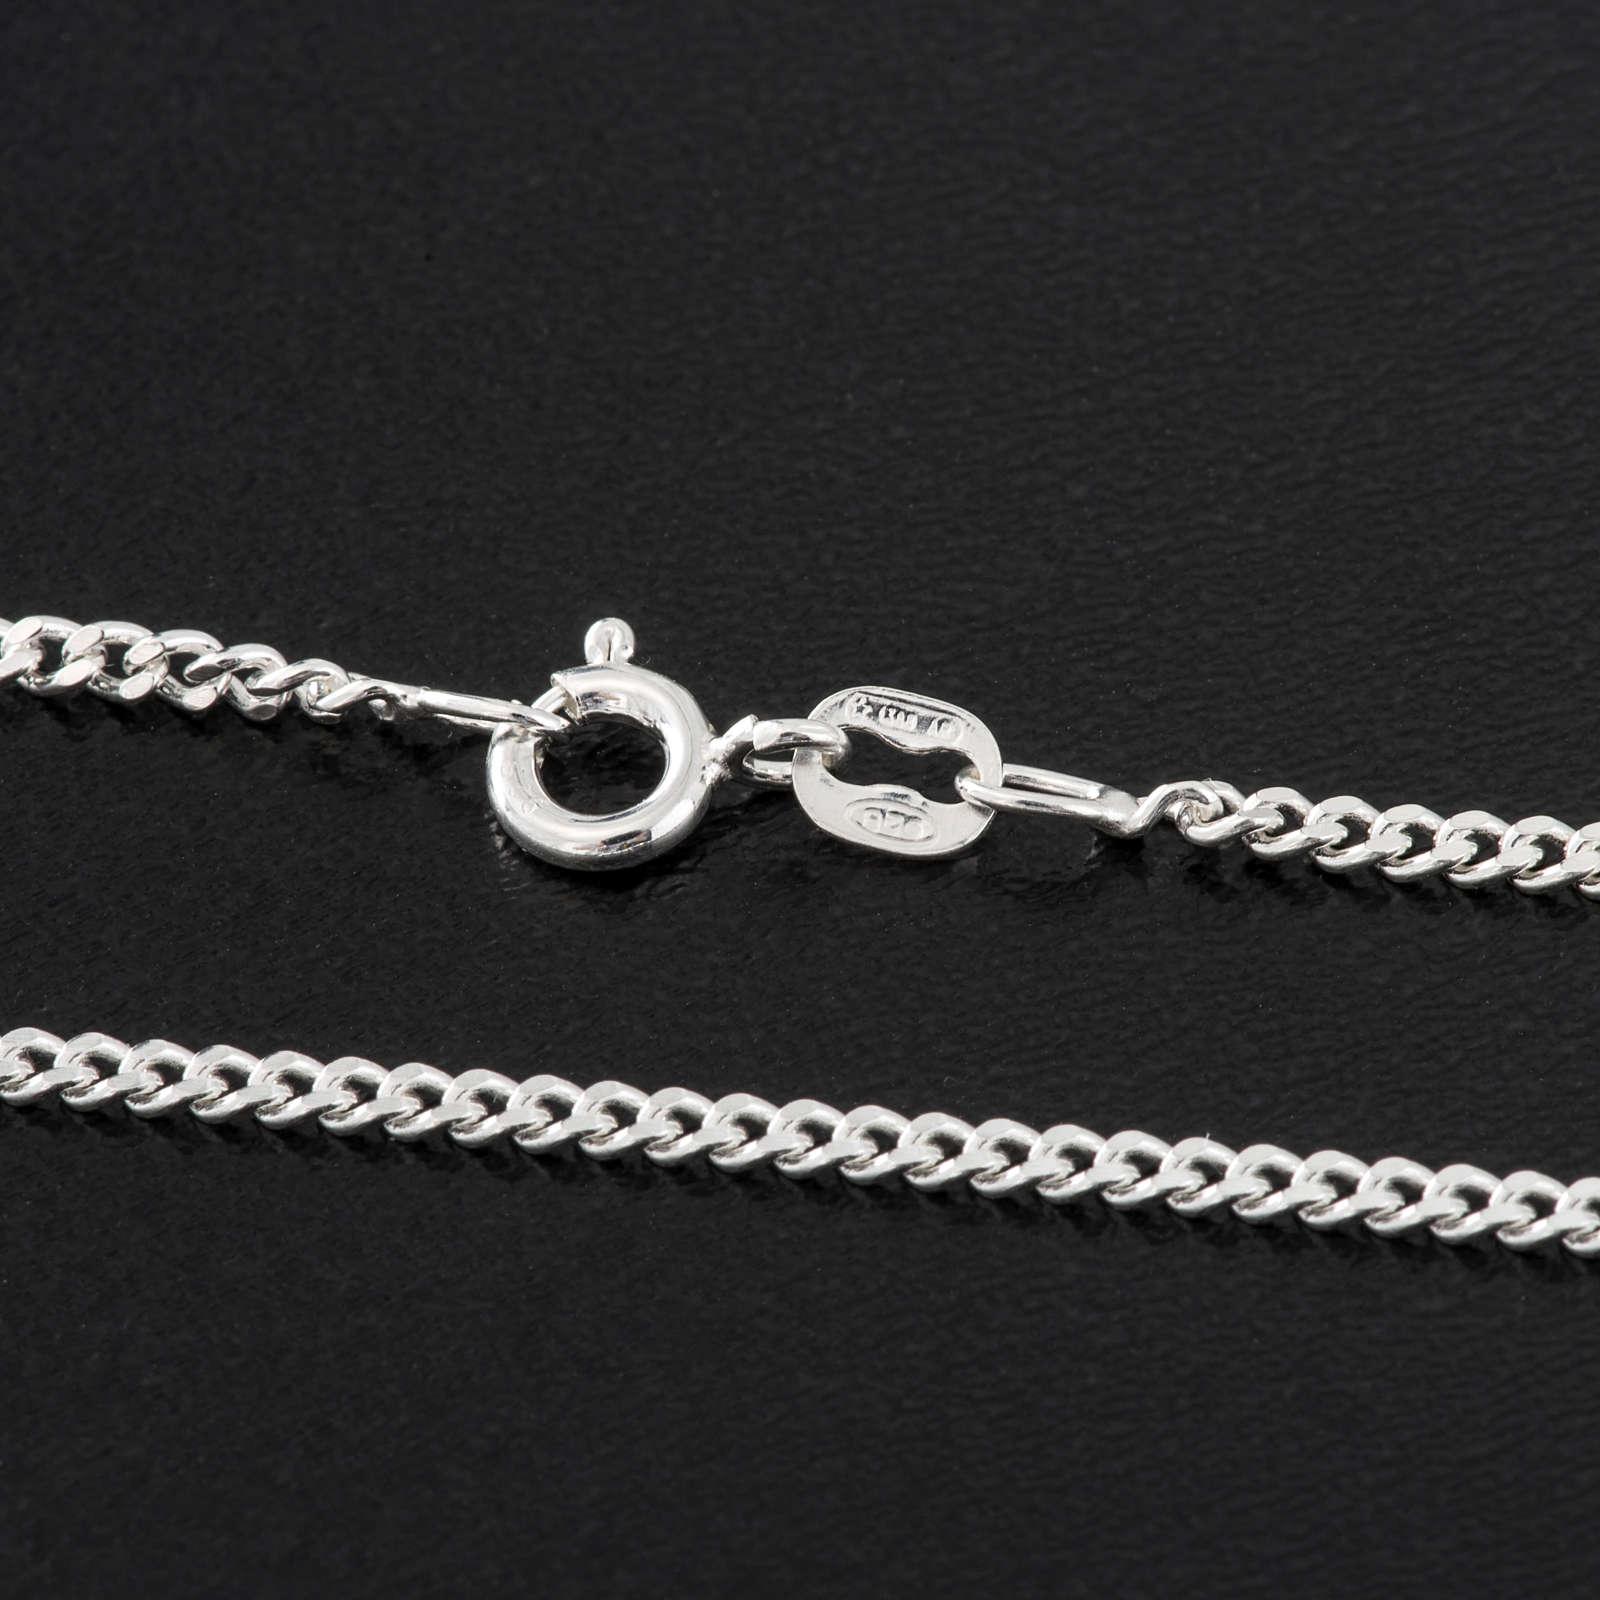 Corrente Groumett prata 925 comprimento 60 cm 4